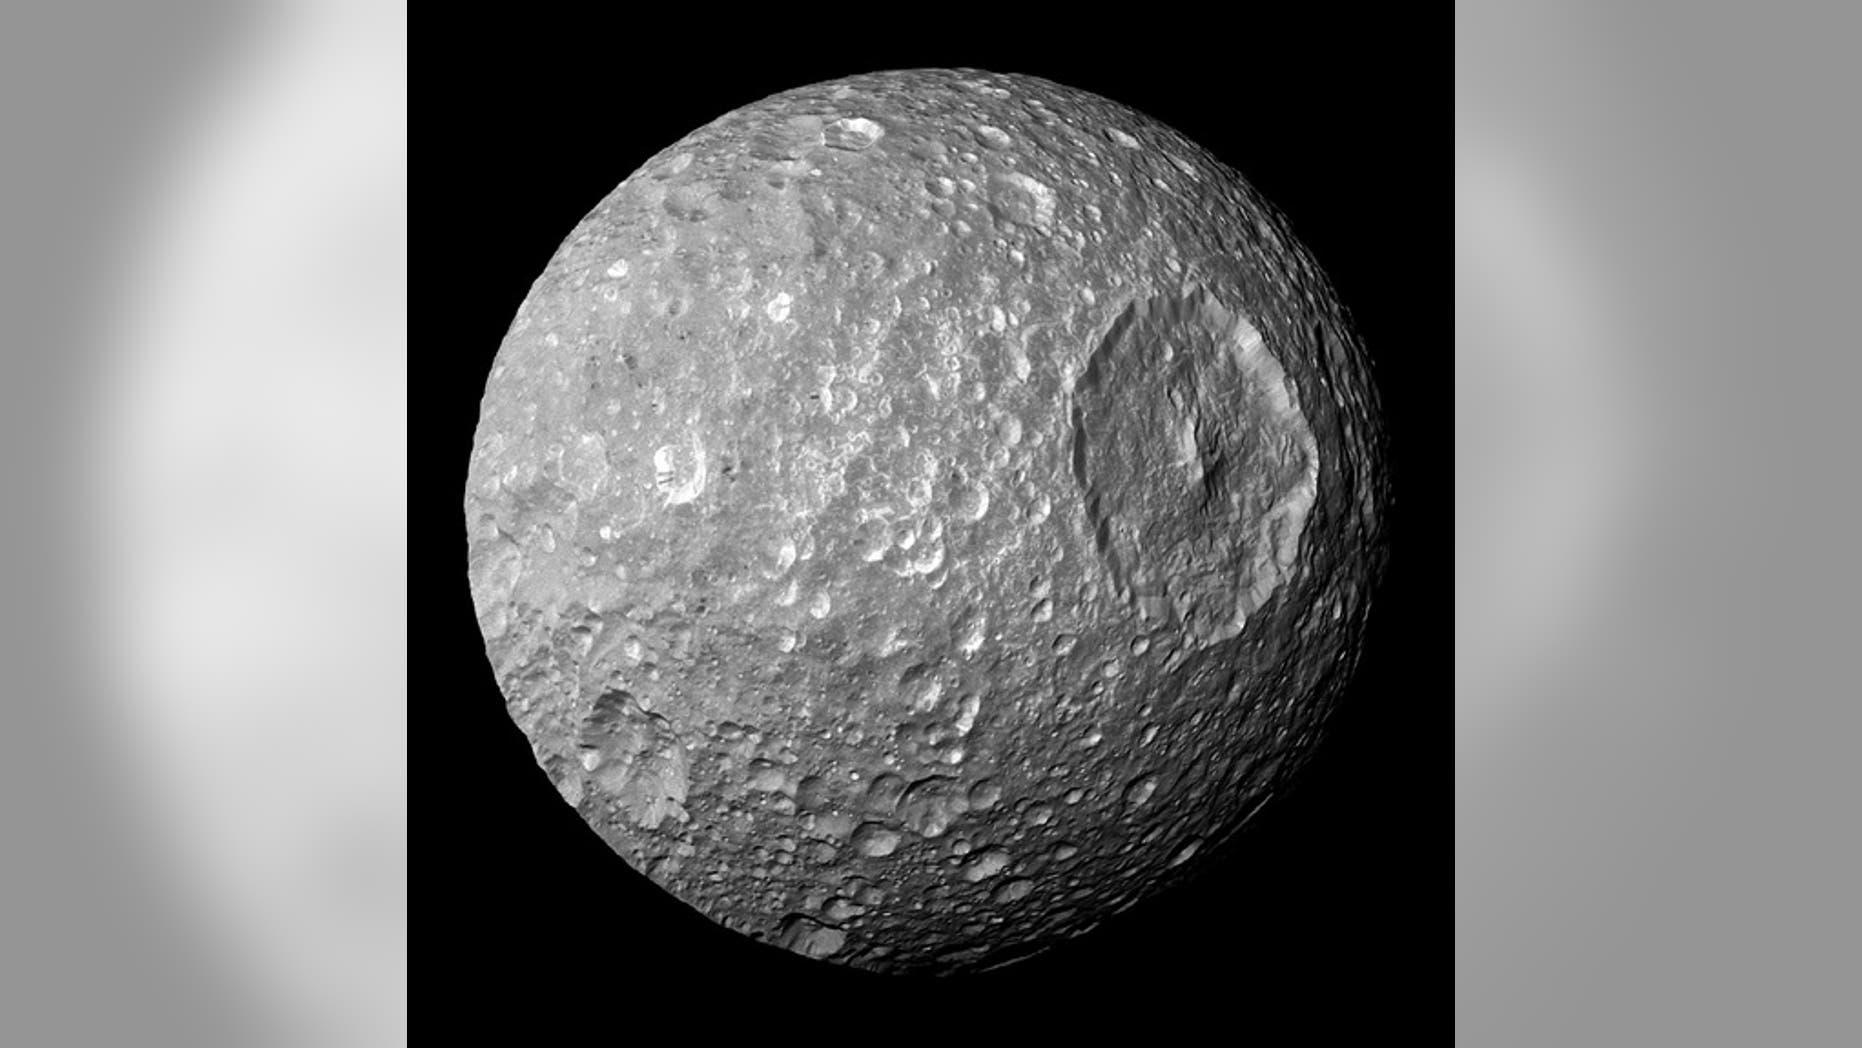 A photo of Saturn's moon Mimas.